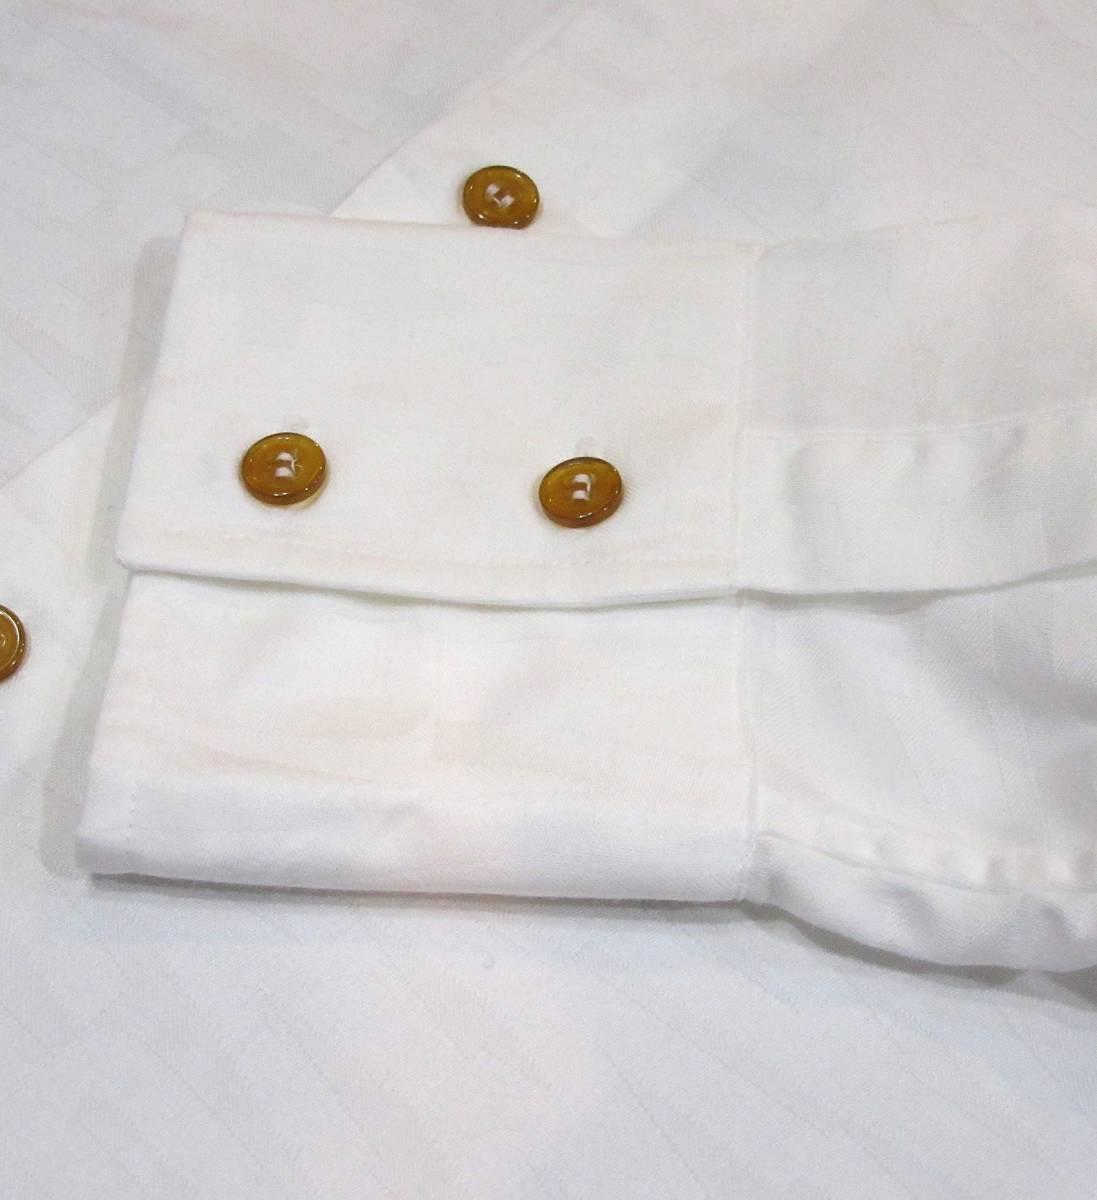 Vivienne Westwood MAN ロゴ総柄 オジークラークシャツ アシンメトリー コットン ブラウス 白 ORB刺繍 オーブ_画像5